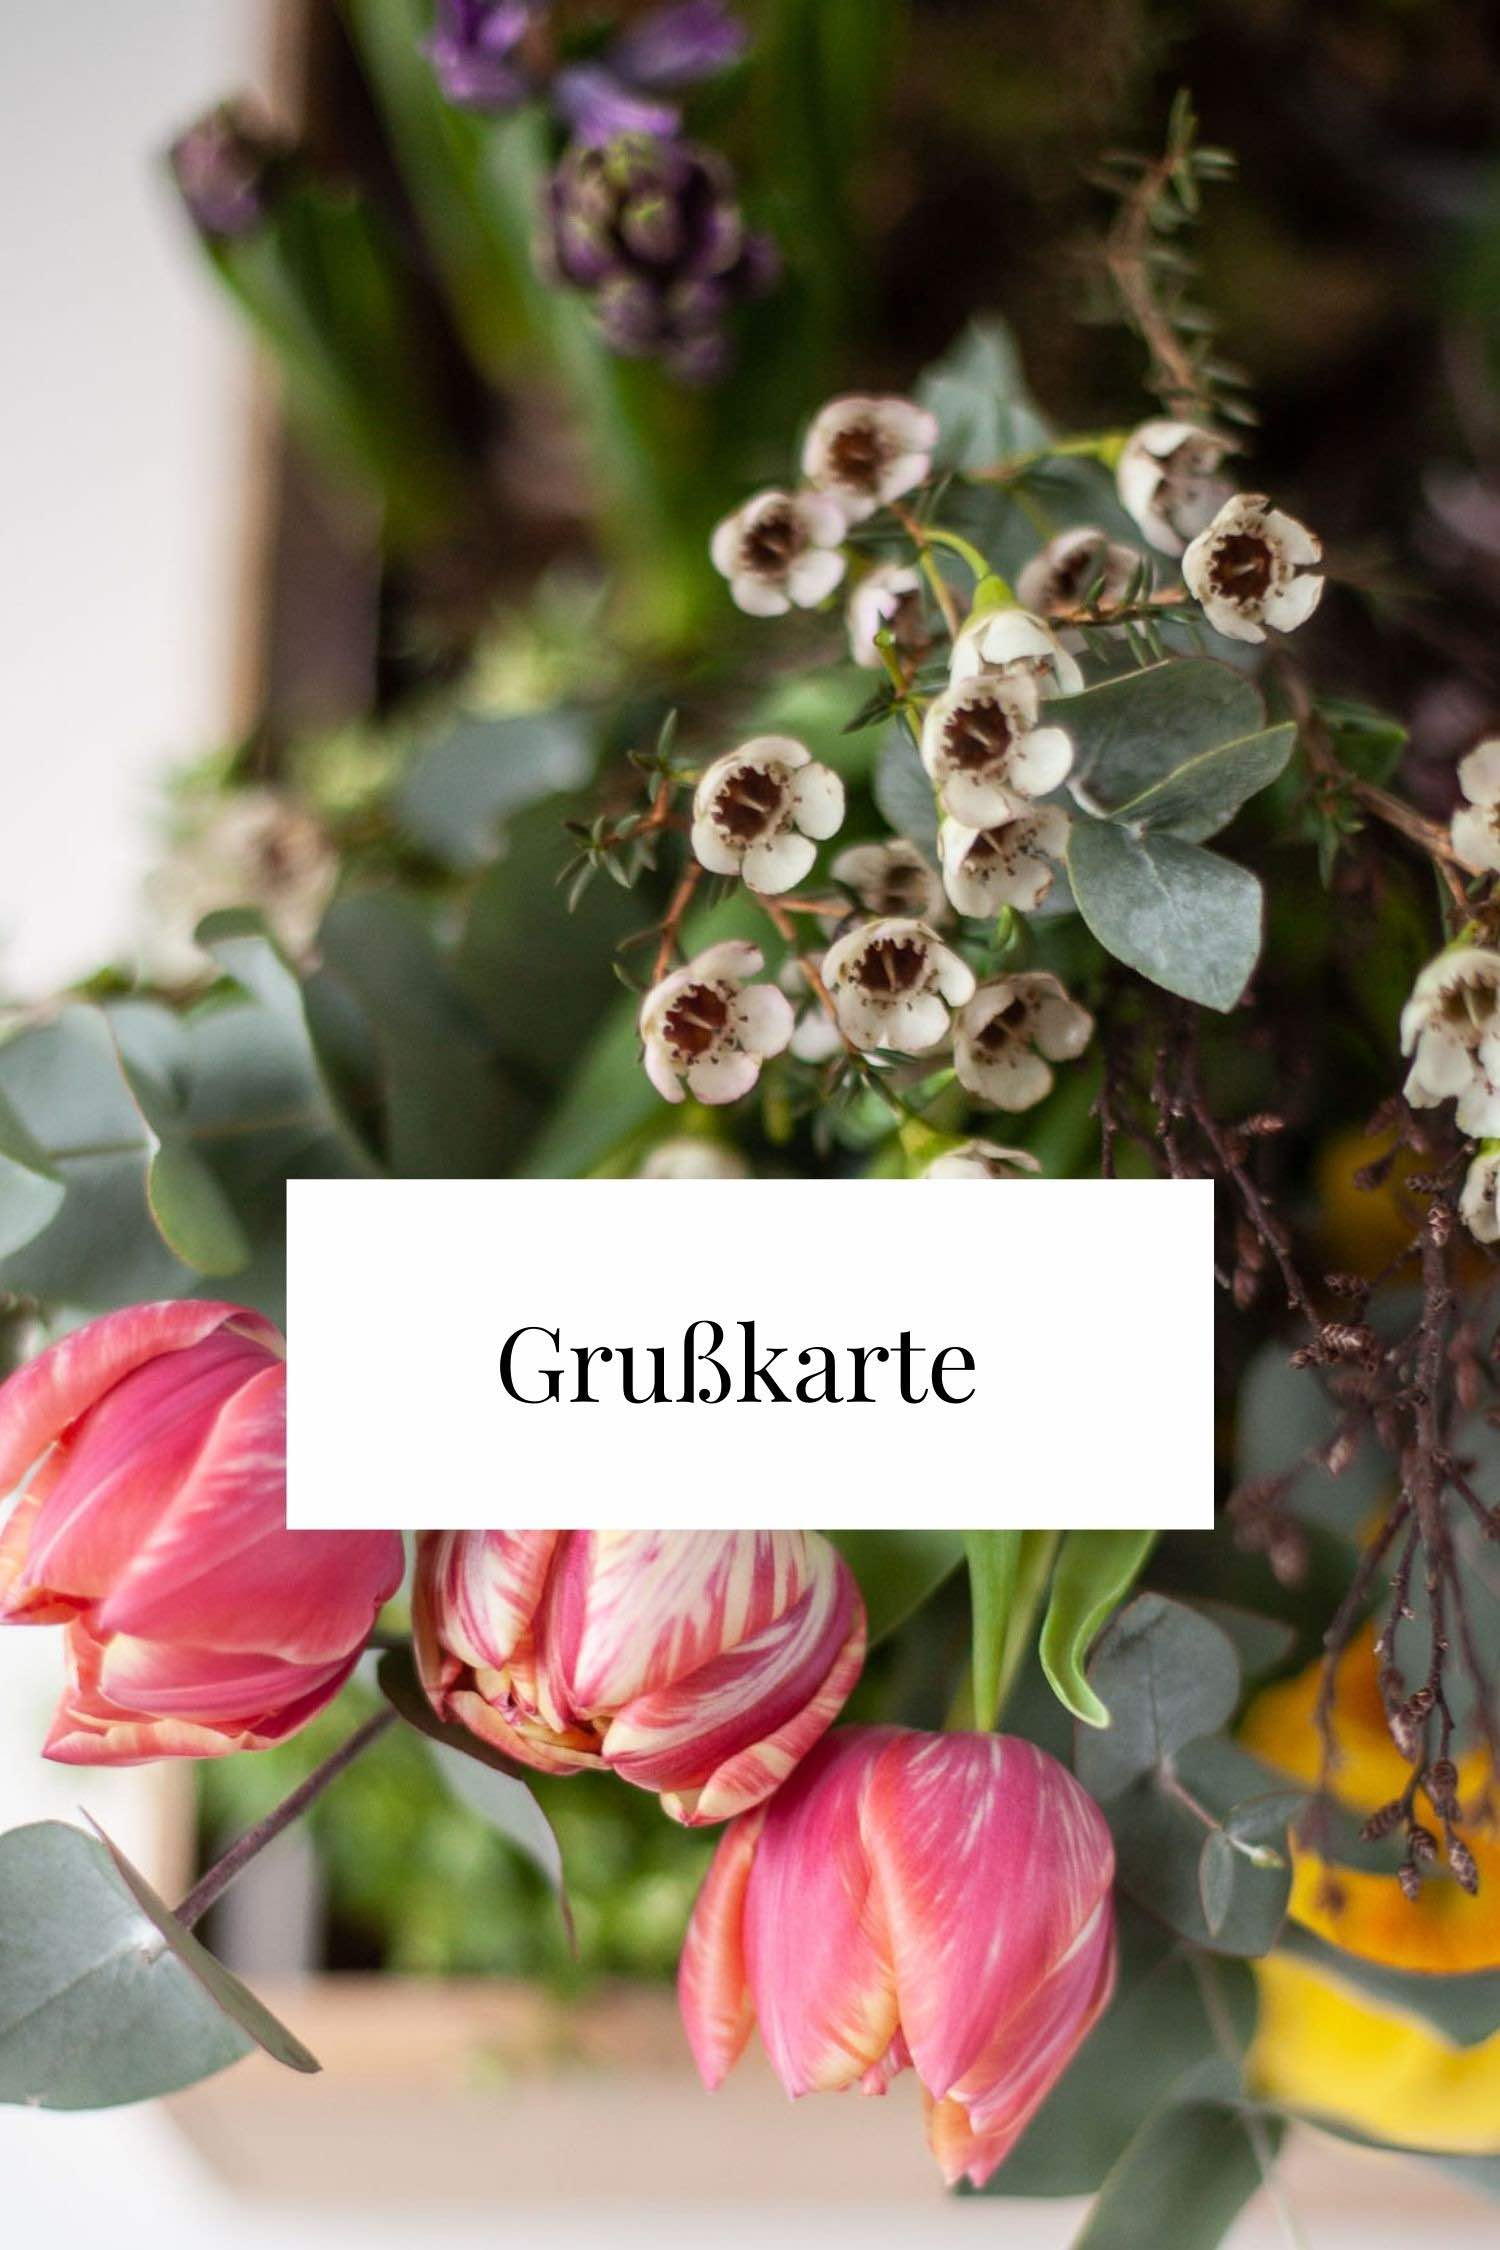 Zauberblüte Exter Vlotho Blumenladen Onlineshop Grußkarte